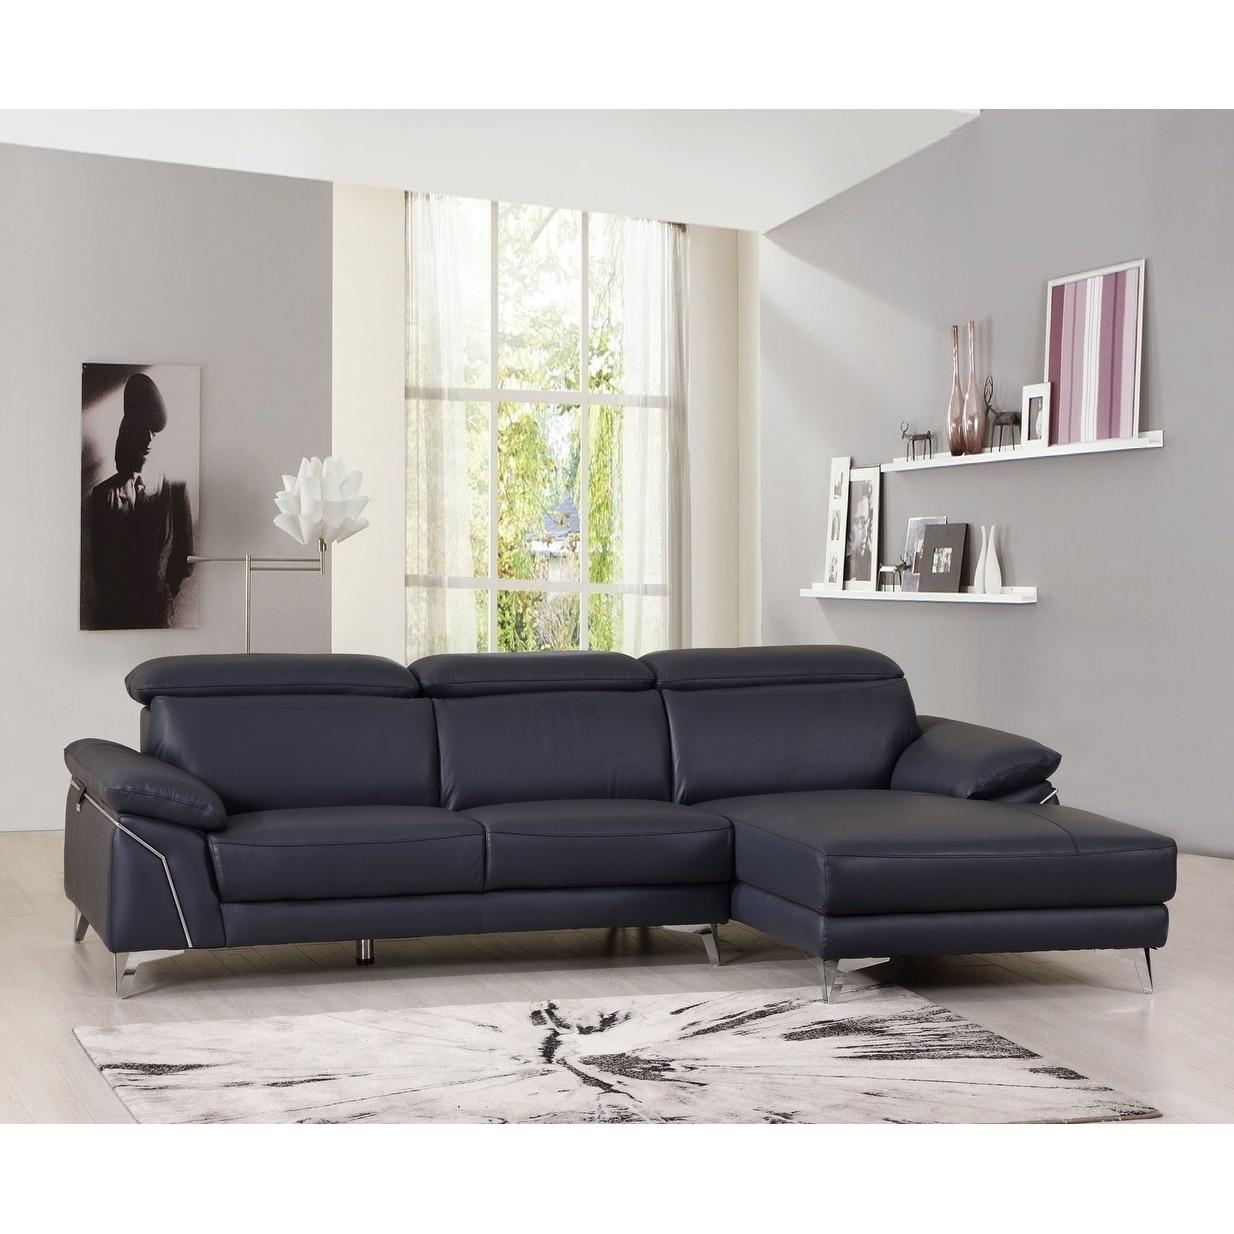 Shop Modern Adjustable Headrest Leather Living Room Sectional Sofa